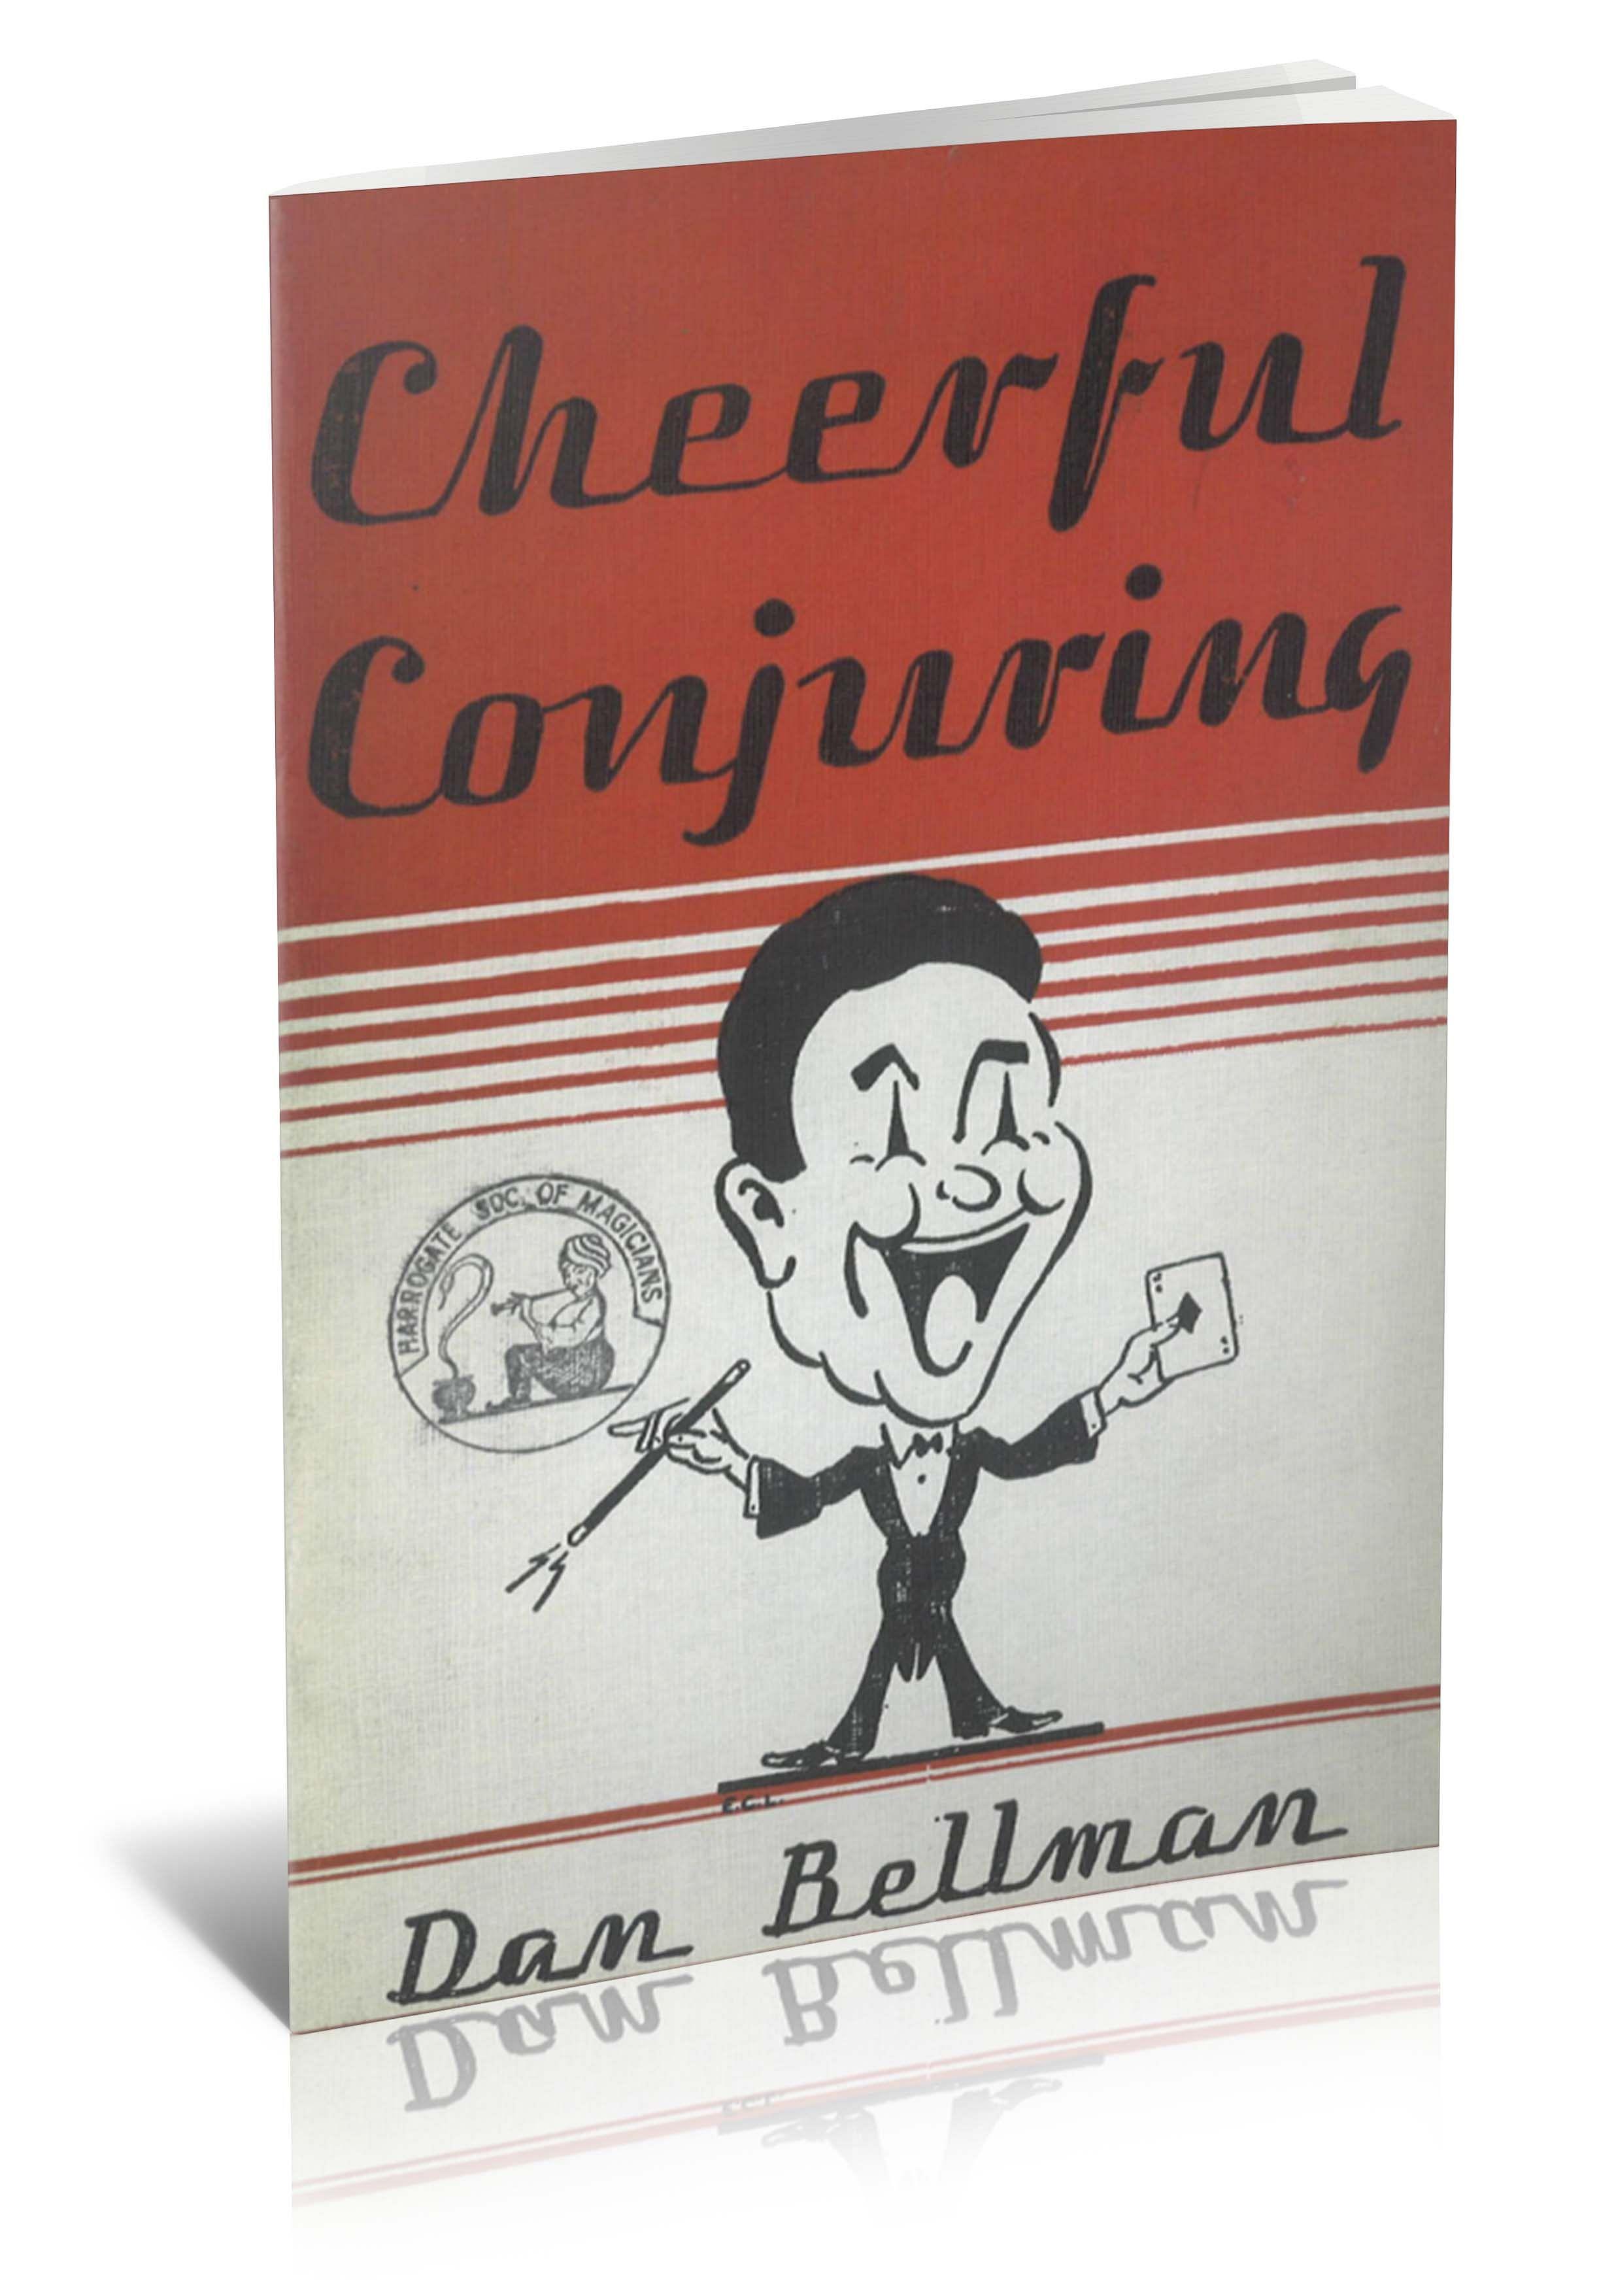 Cheerful Conjuring - magic